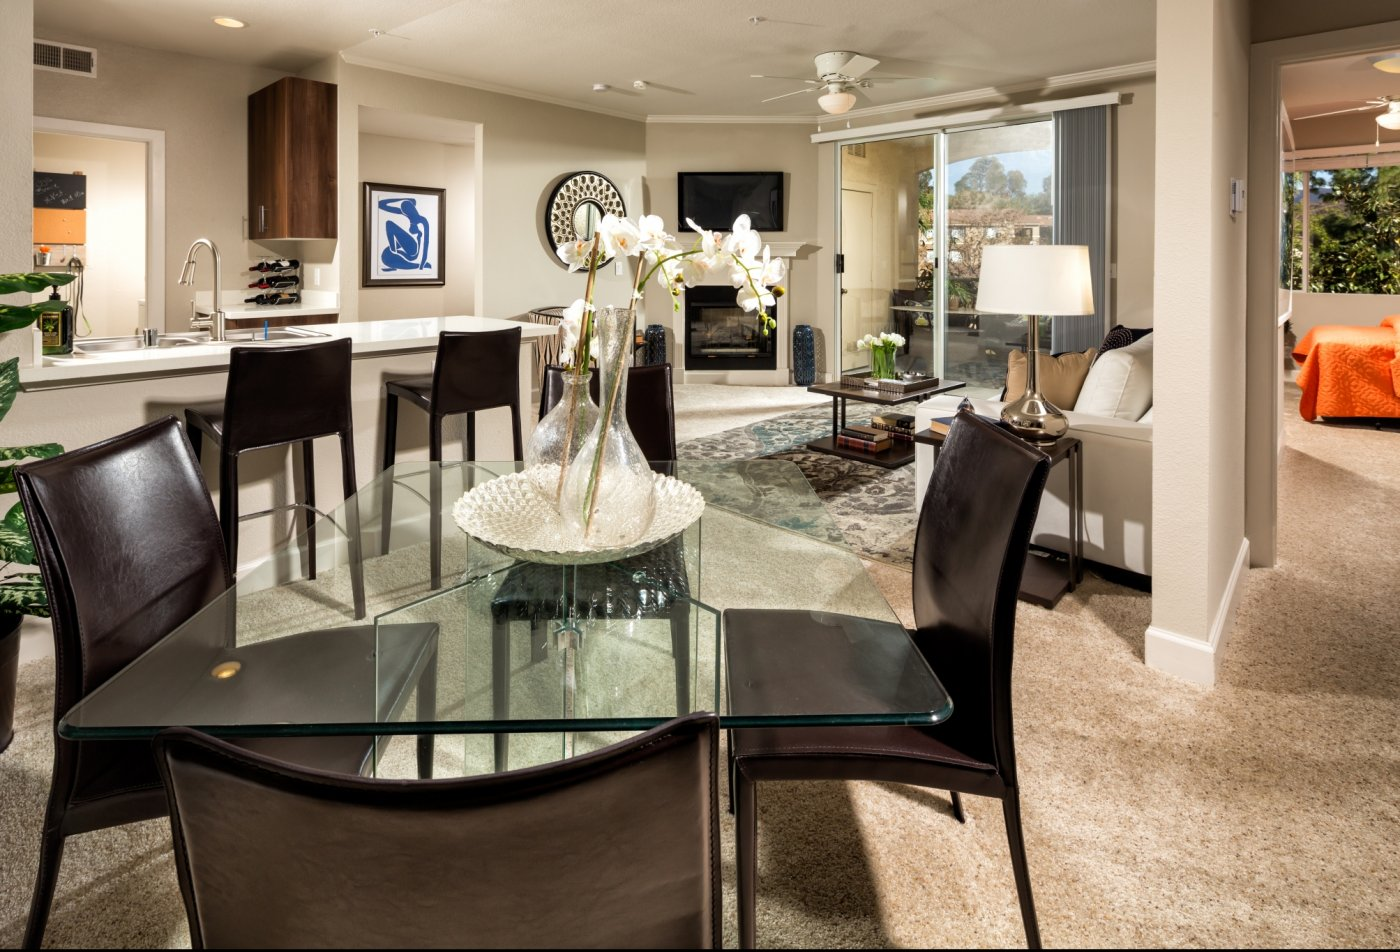 Spacious Dining Room   Apartments In Irvine CA   Avila at Rancho Santa Margarita